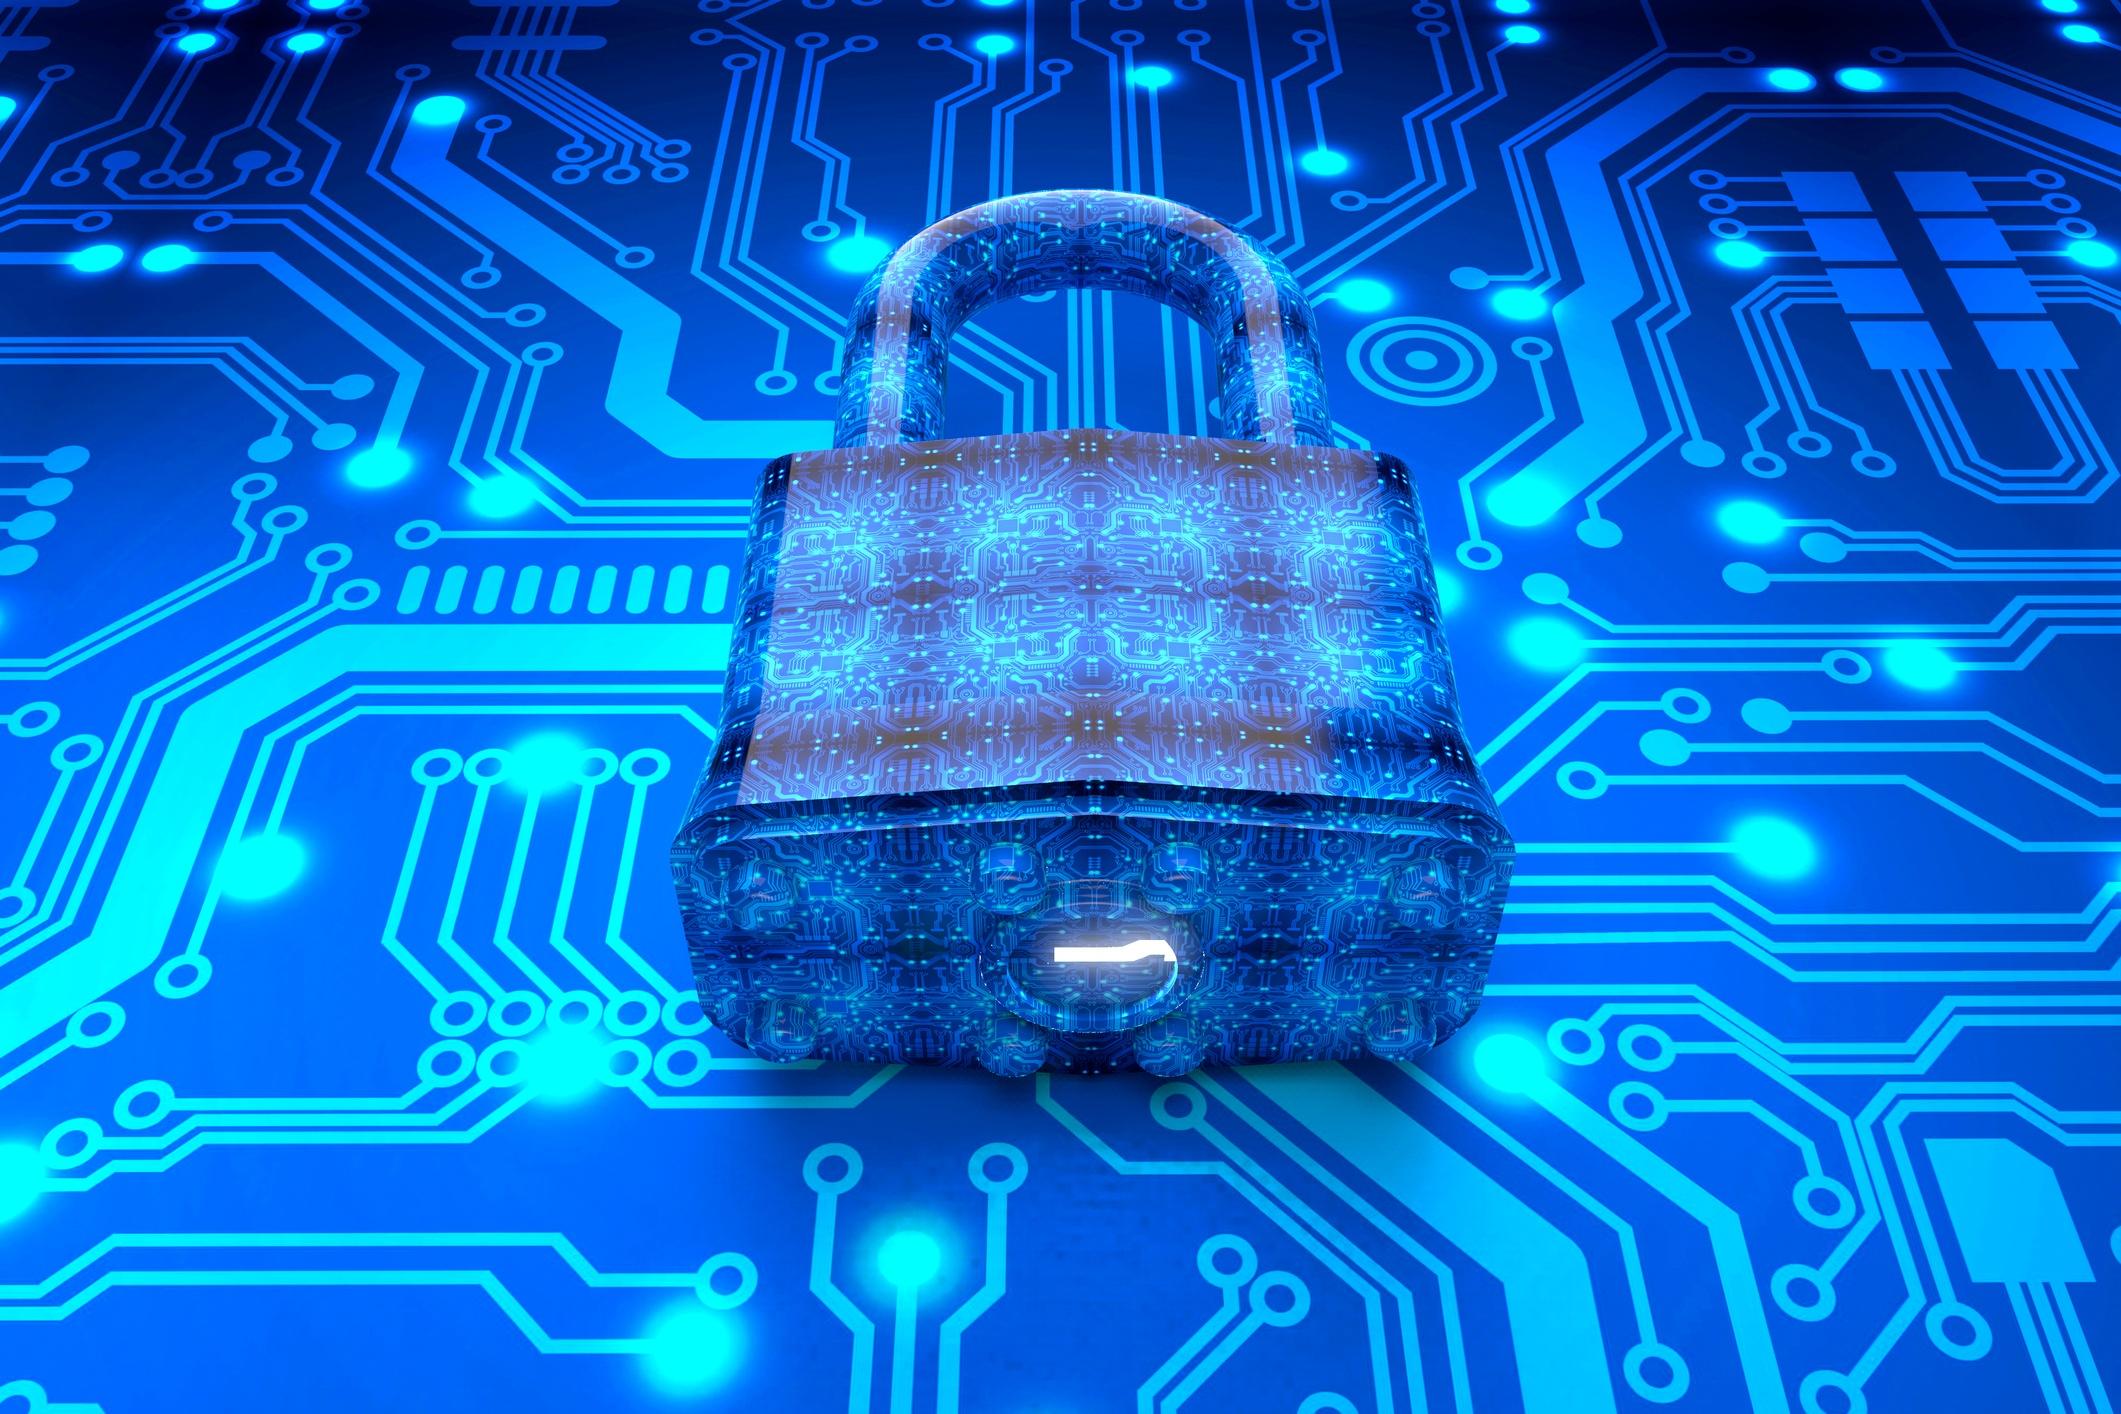 seguridad de datos cs.jpg